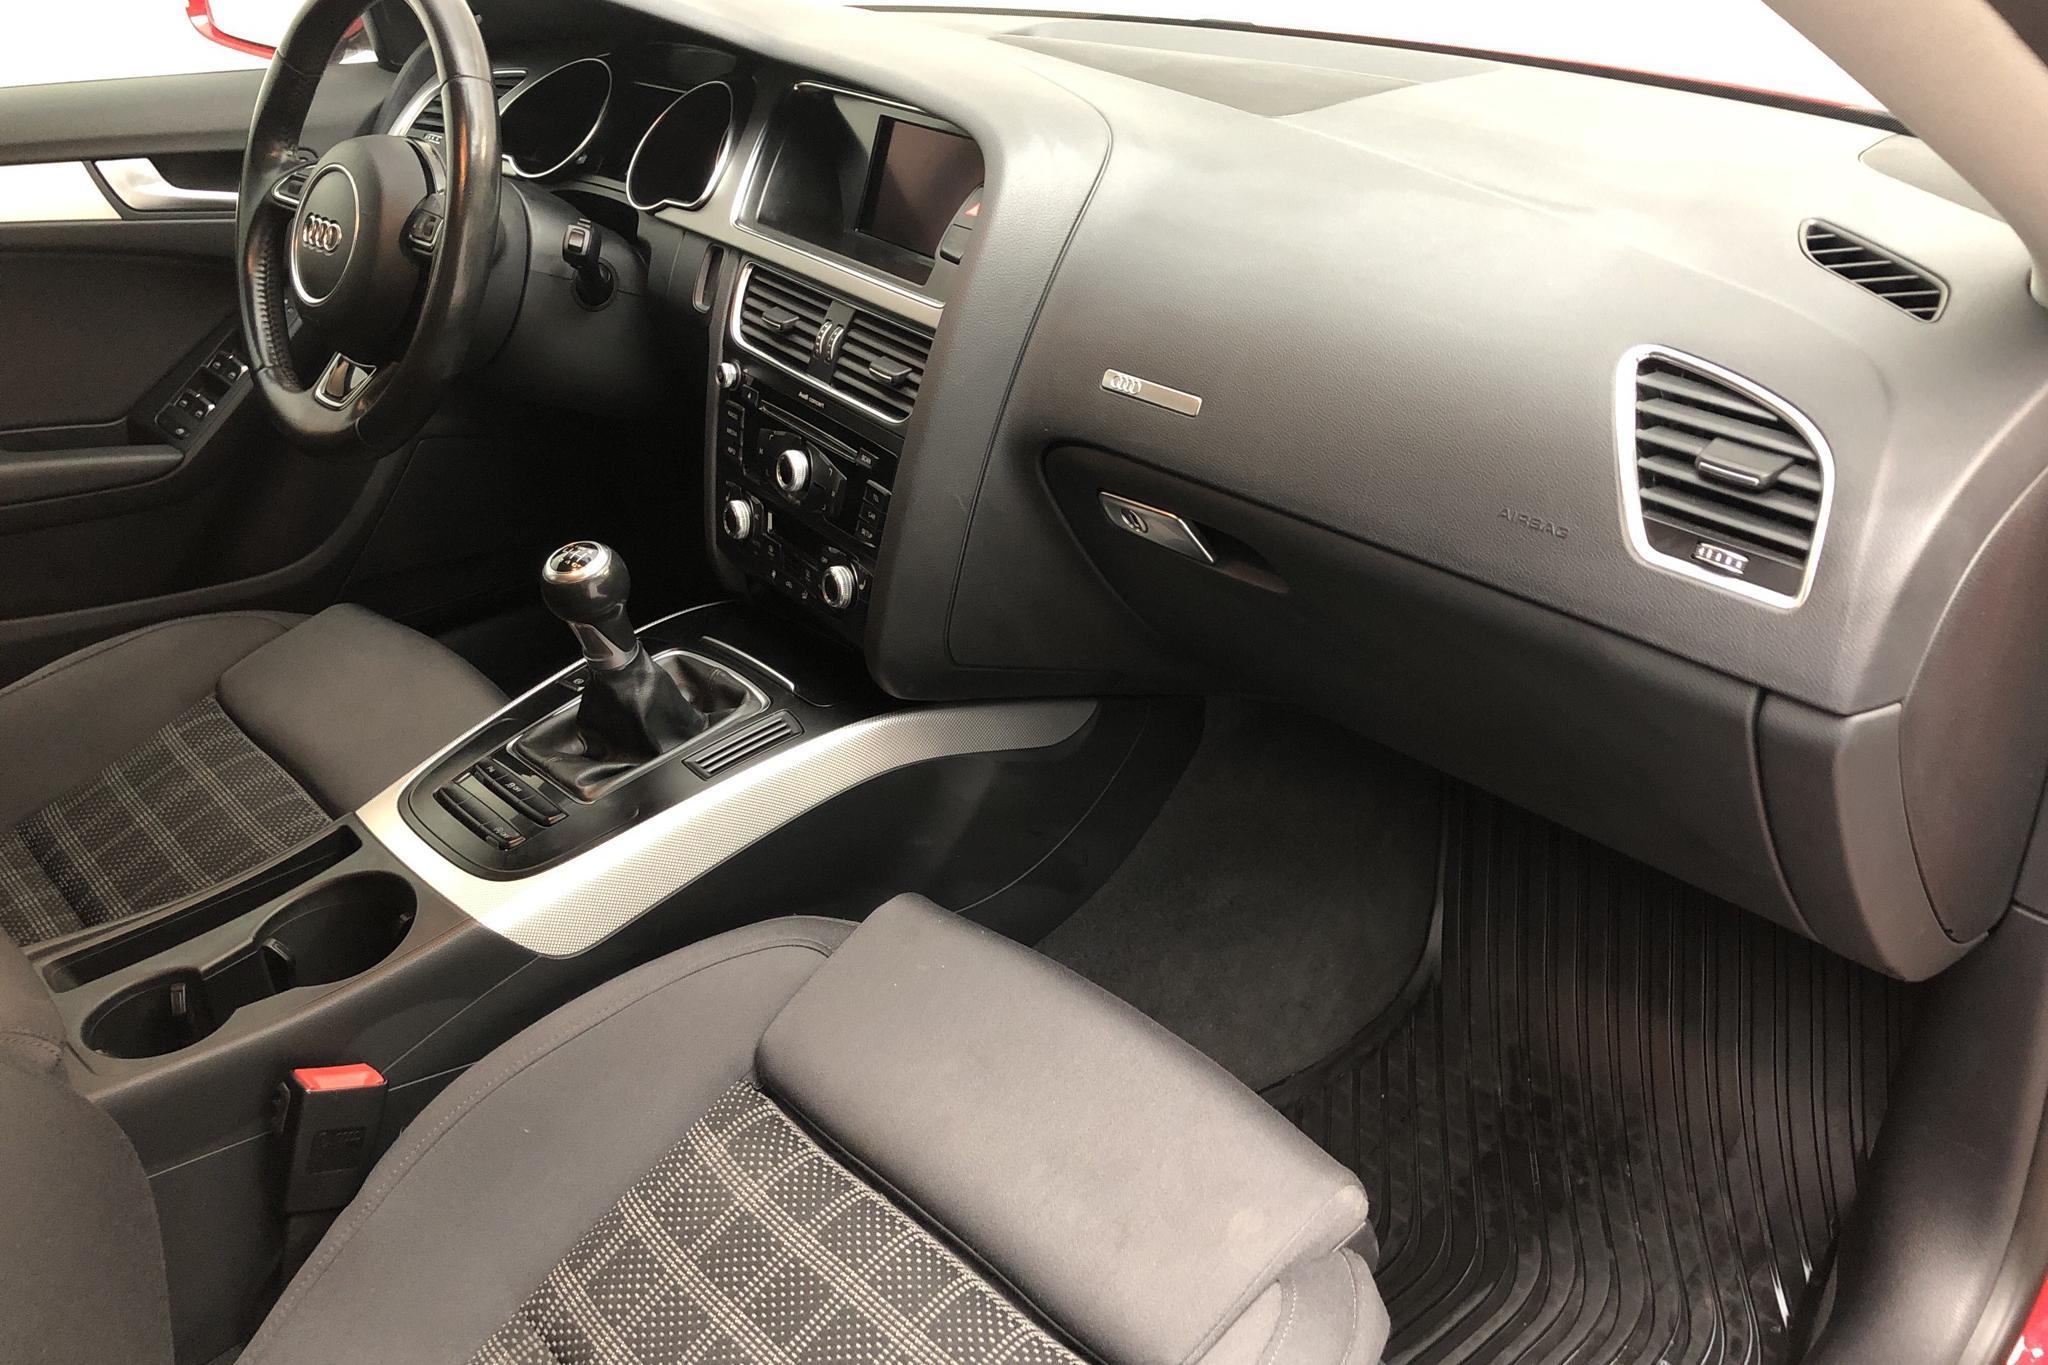 Audi A5 1.8 TFSI Sportback (170hk) - 138 040 km - Manual - red - 2012